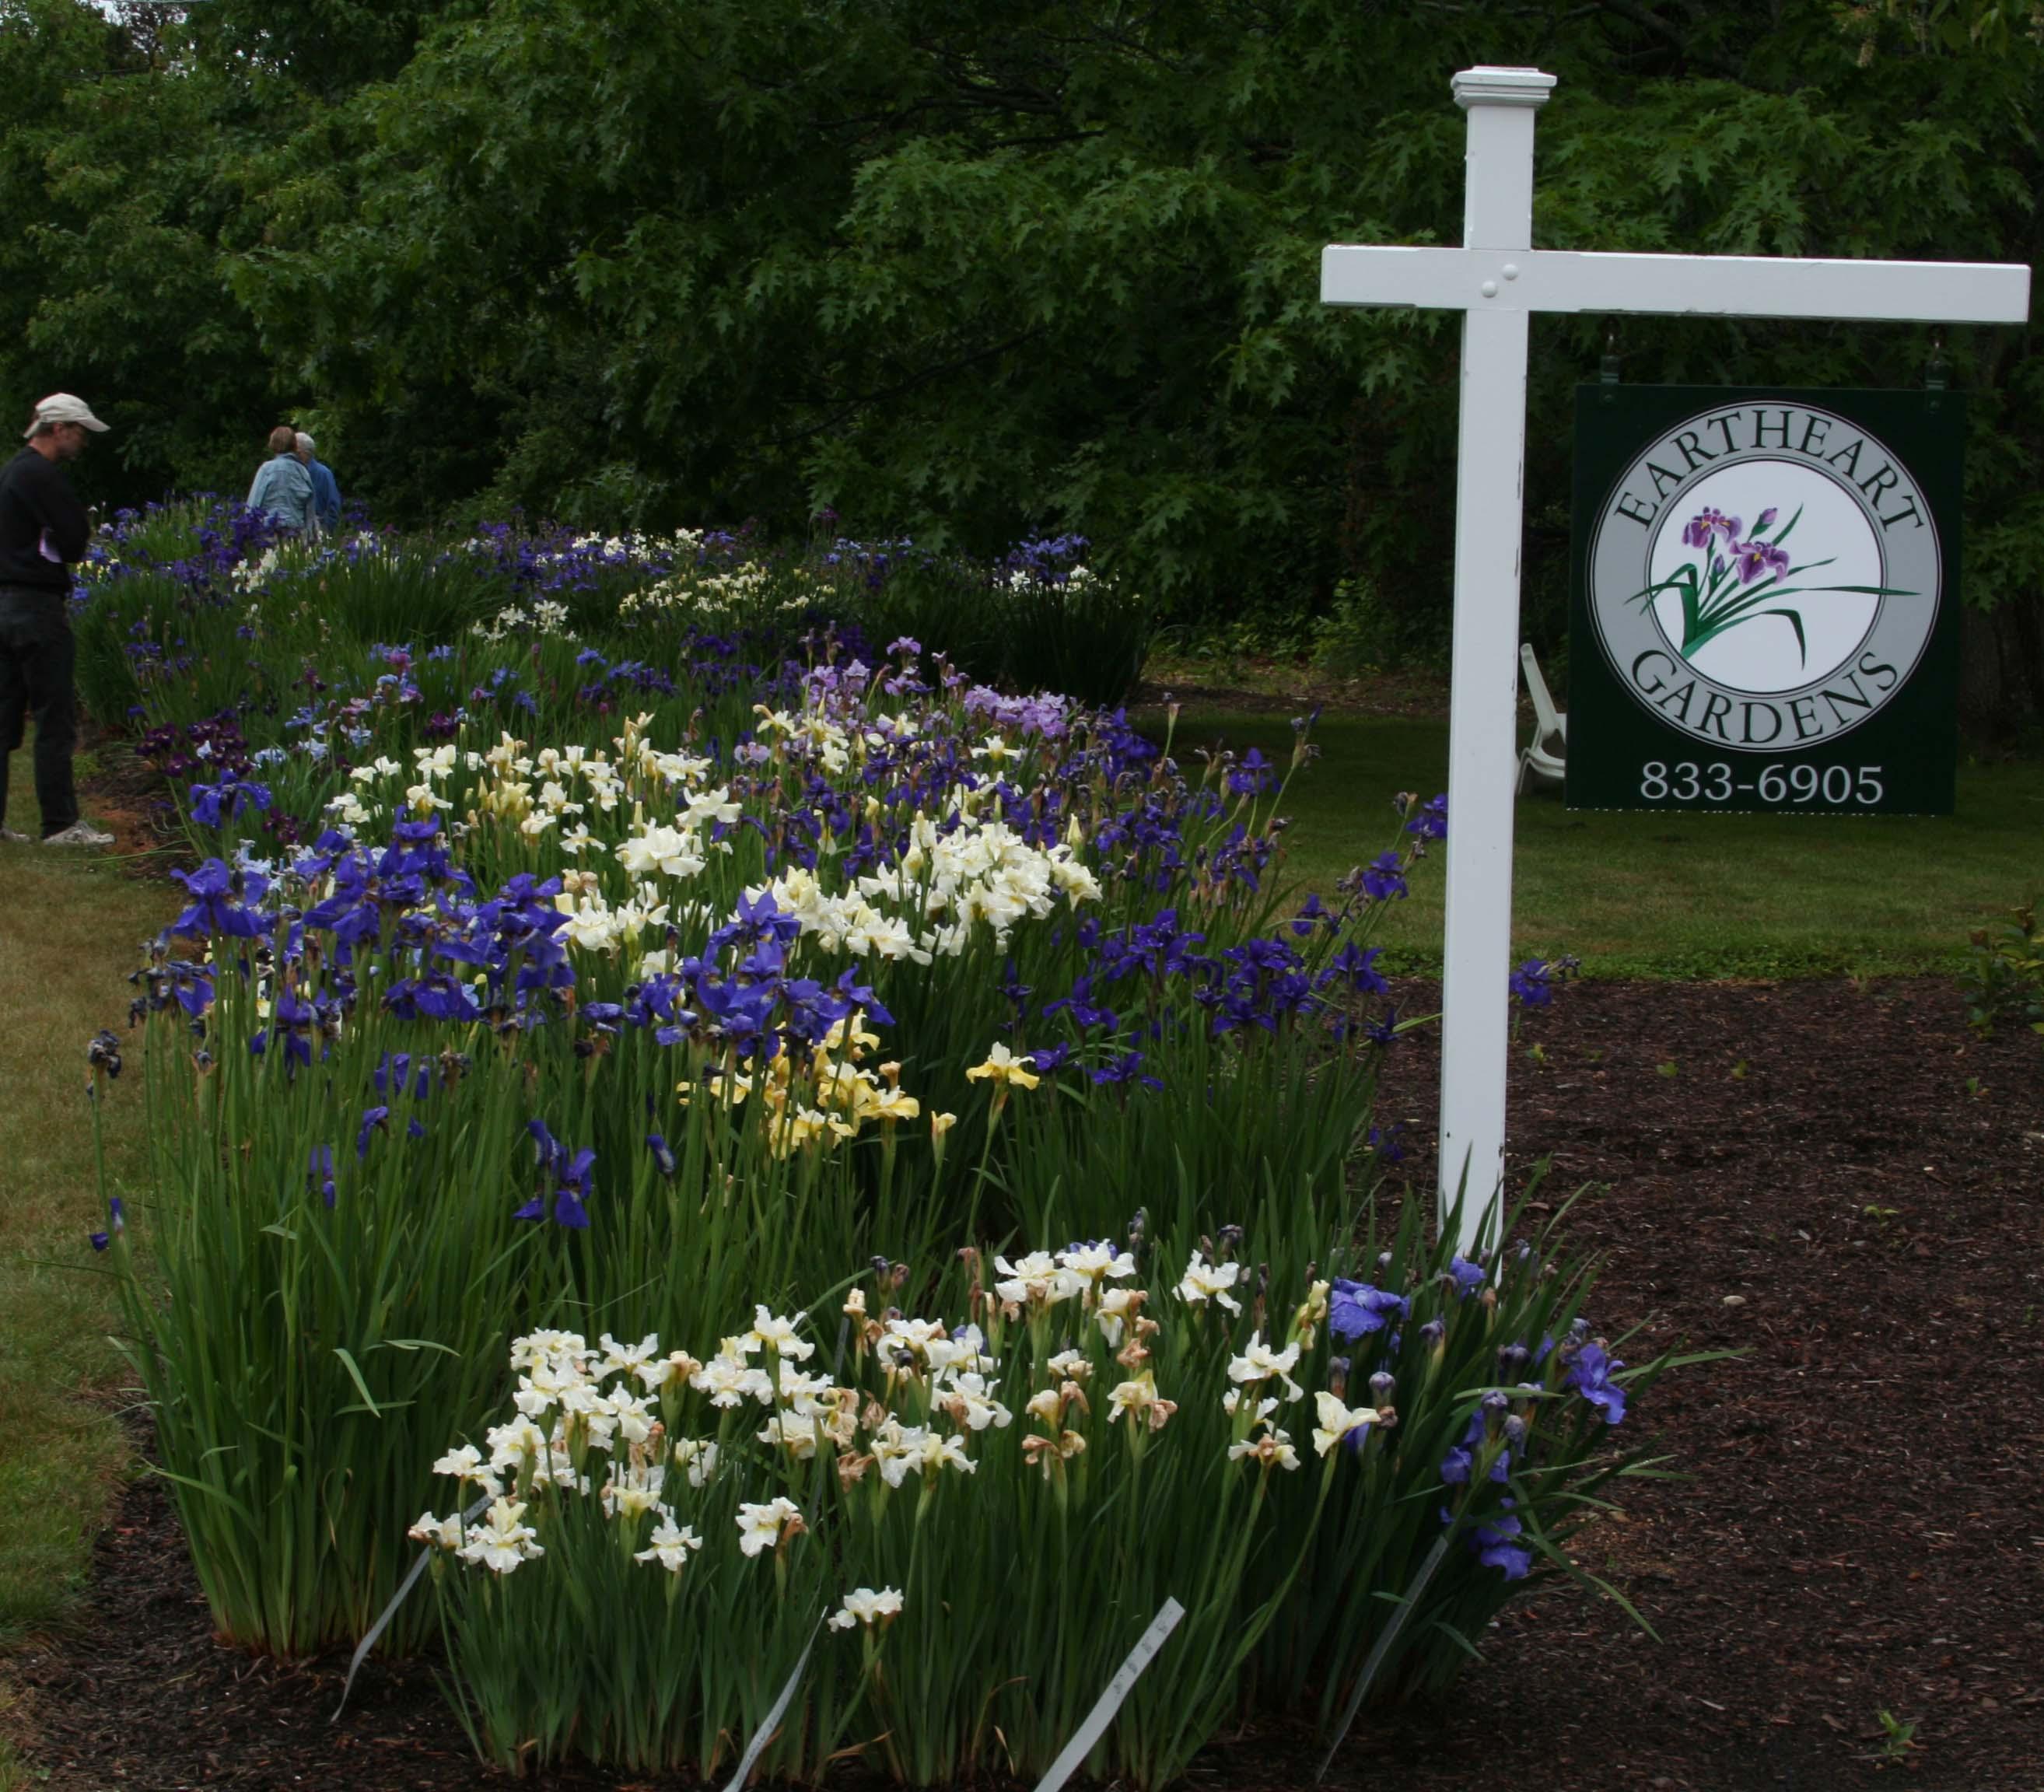 Garden Nursery in Harpswell Maine